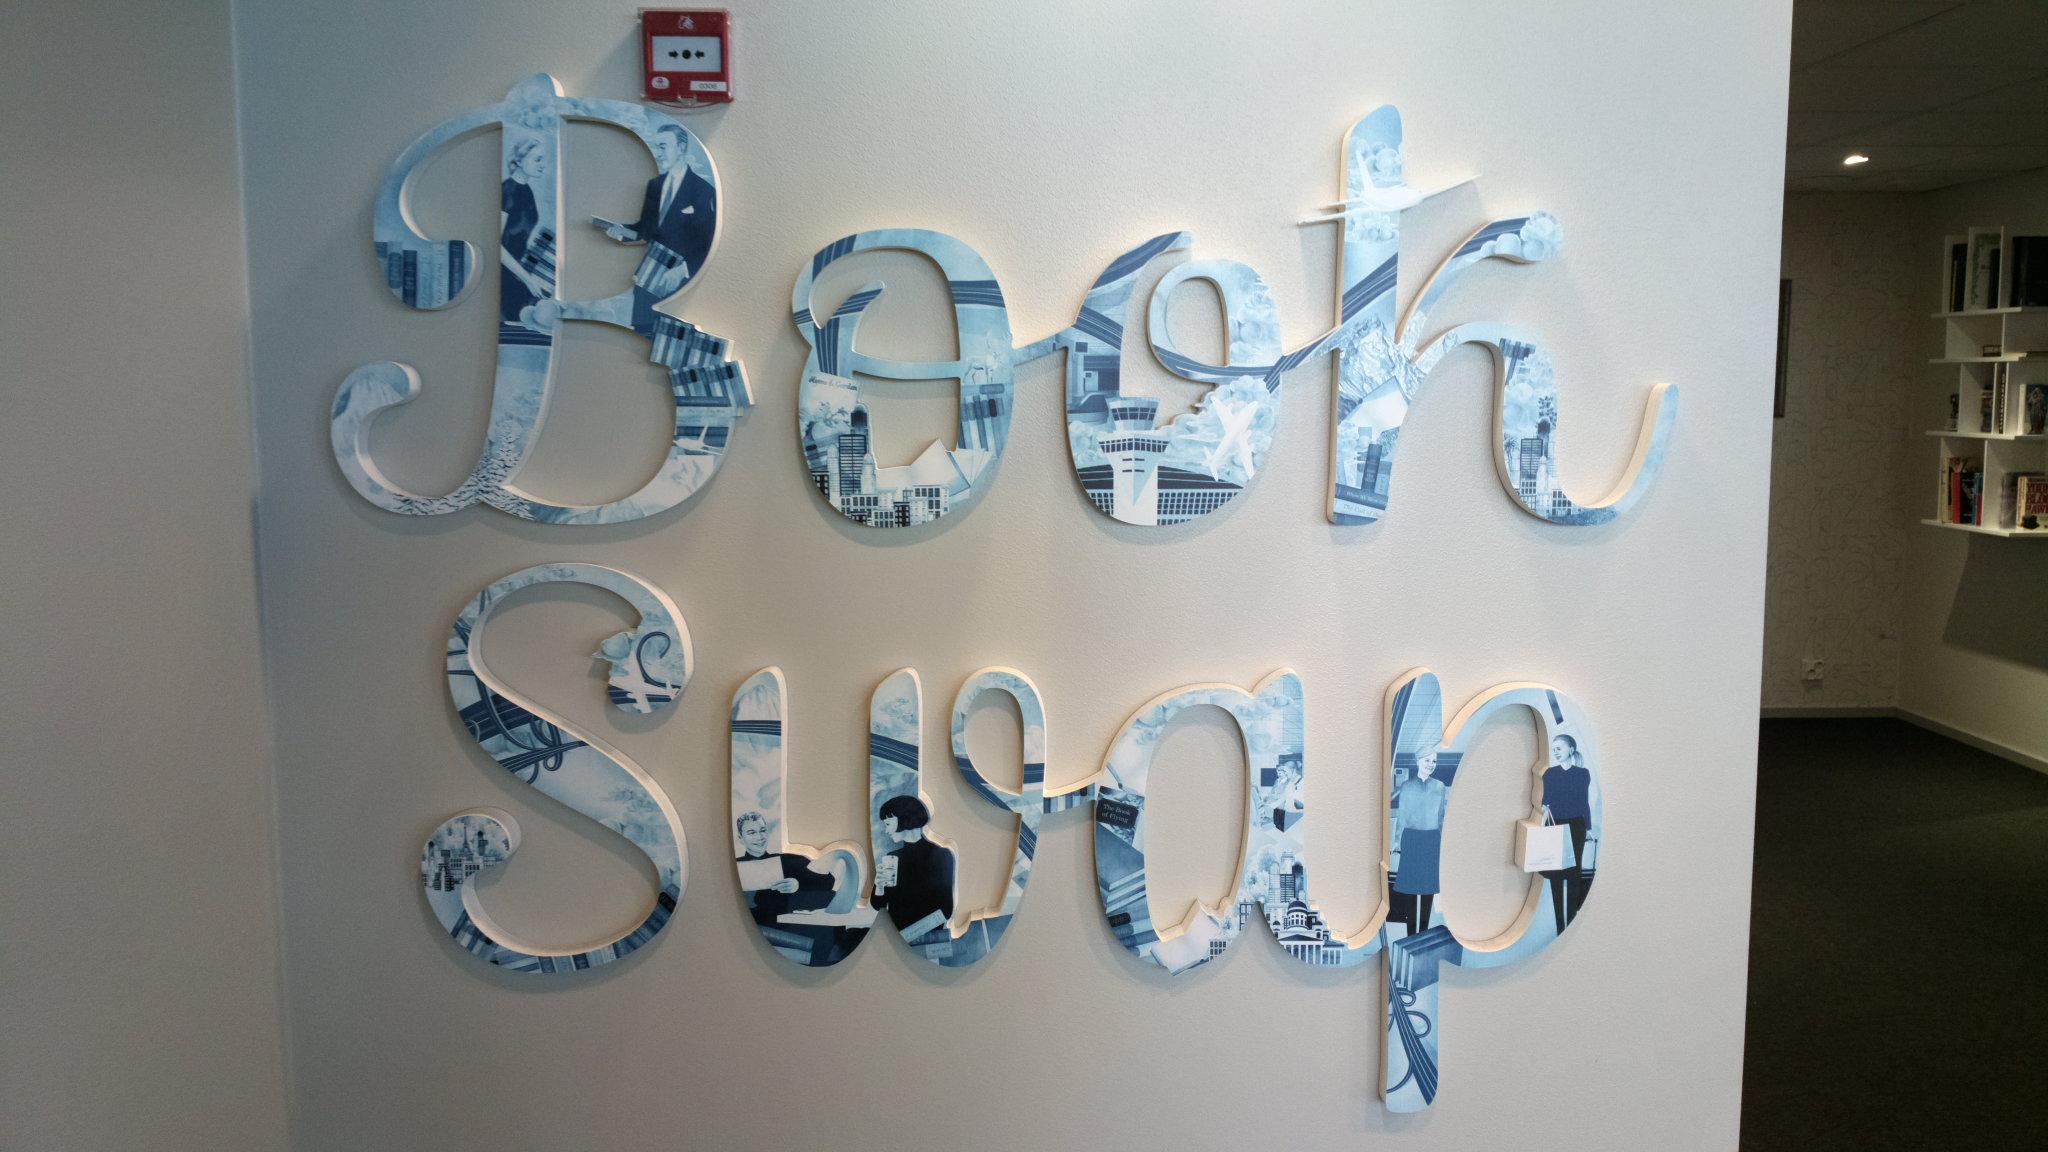 Bookaddicts Unite: PaperBackSwap to the rescue